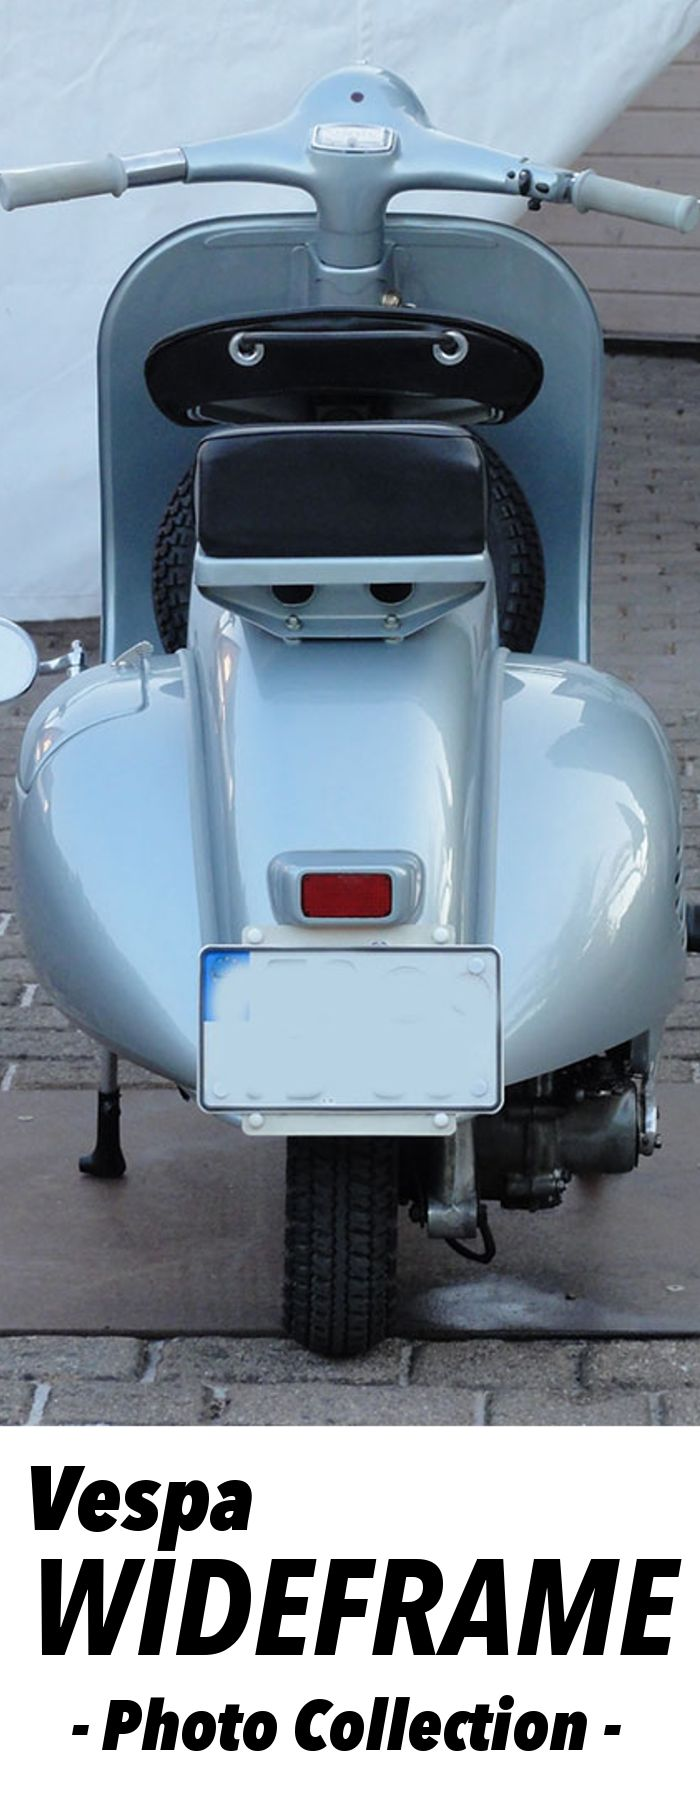 64 best Mobile Shops images on Pinterest | All alone, Antique cars ...